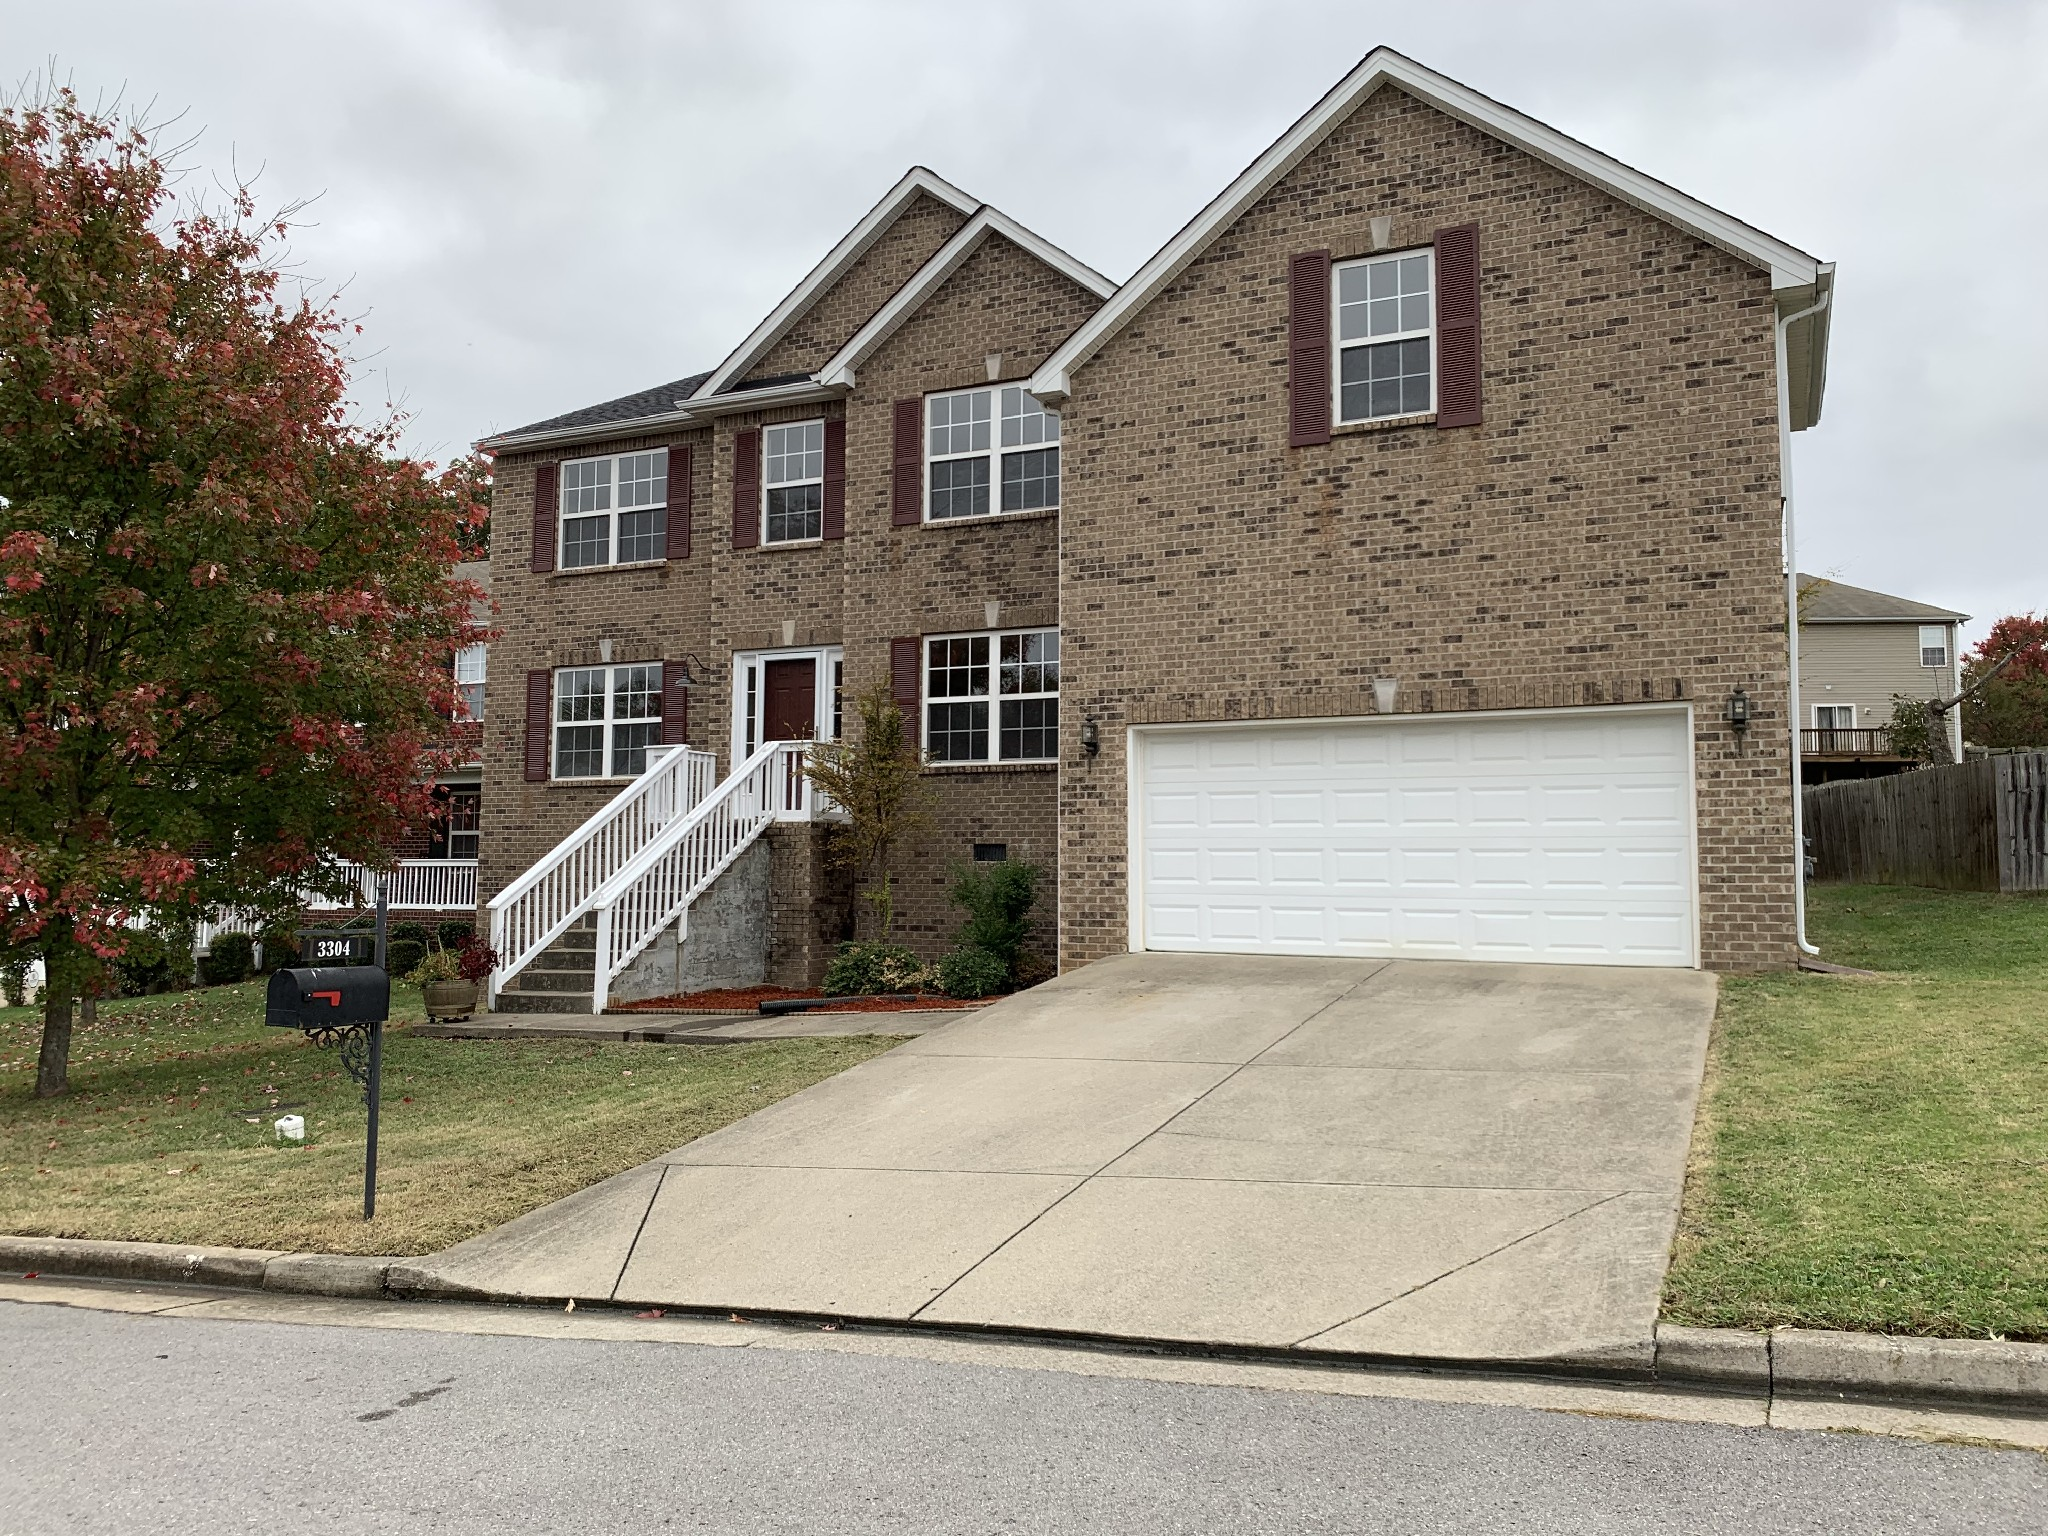 3304 Streamridge Ct, W, Nashville-Antioch in Davidson County County, TN 37013 Home for Sale